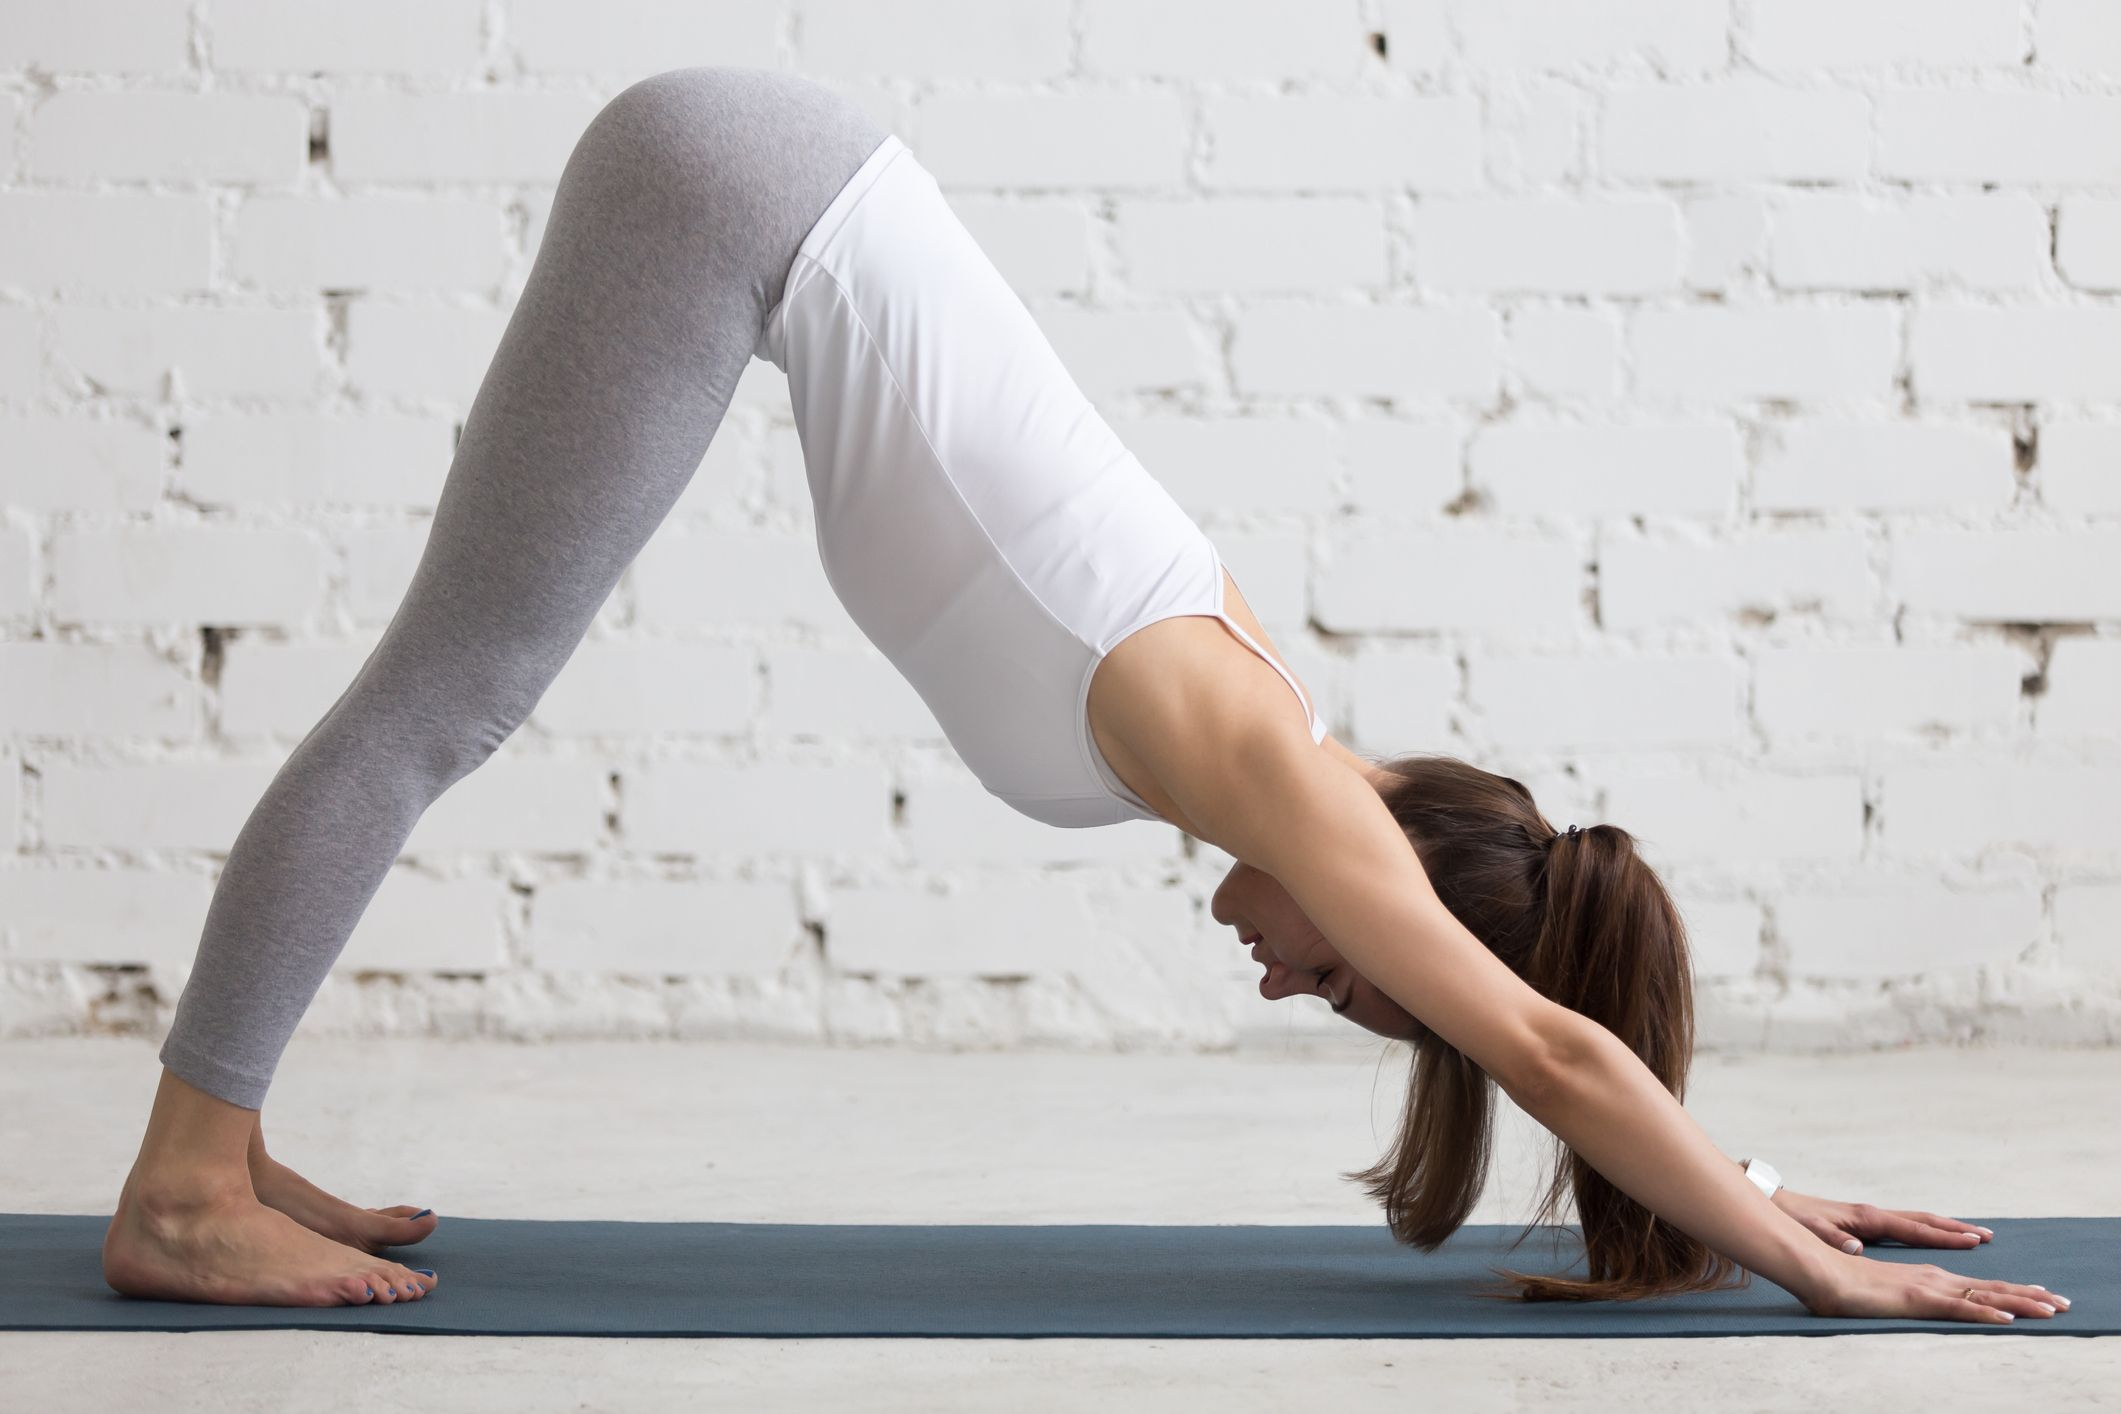 Yoga Indoors: Downward Facing Dog Pose